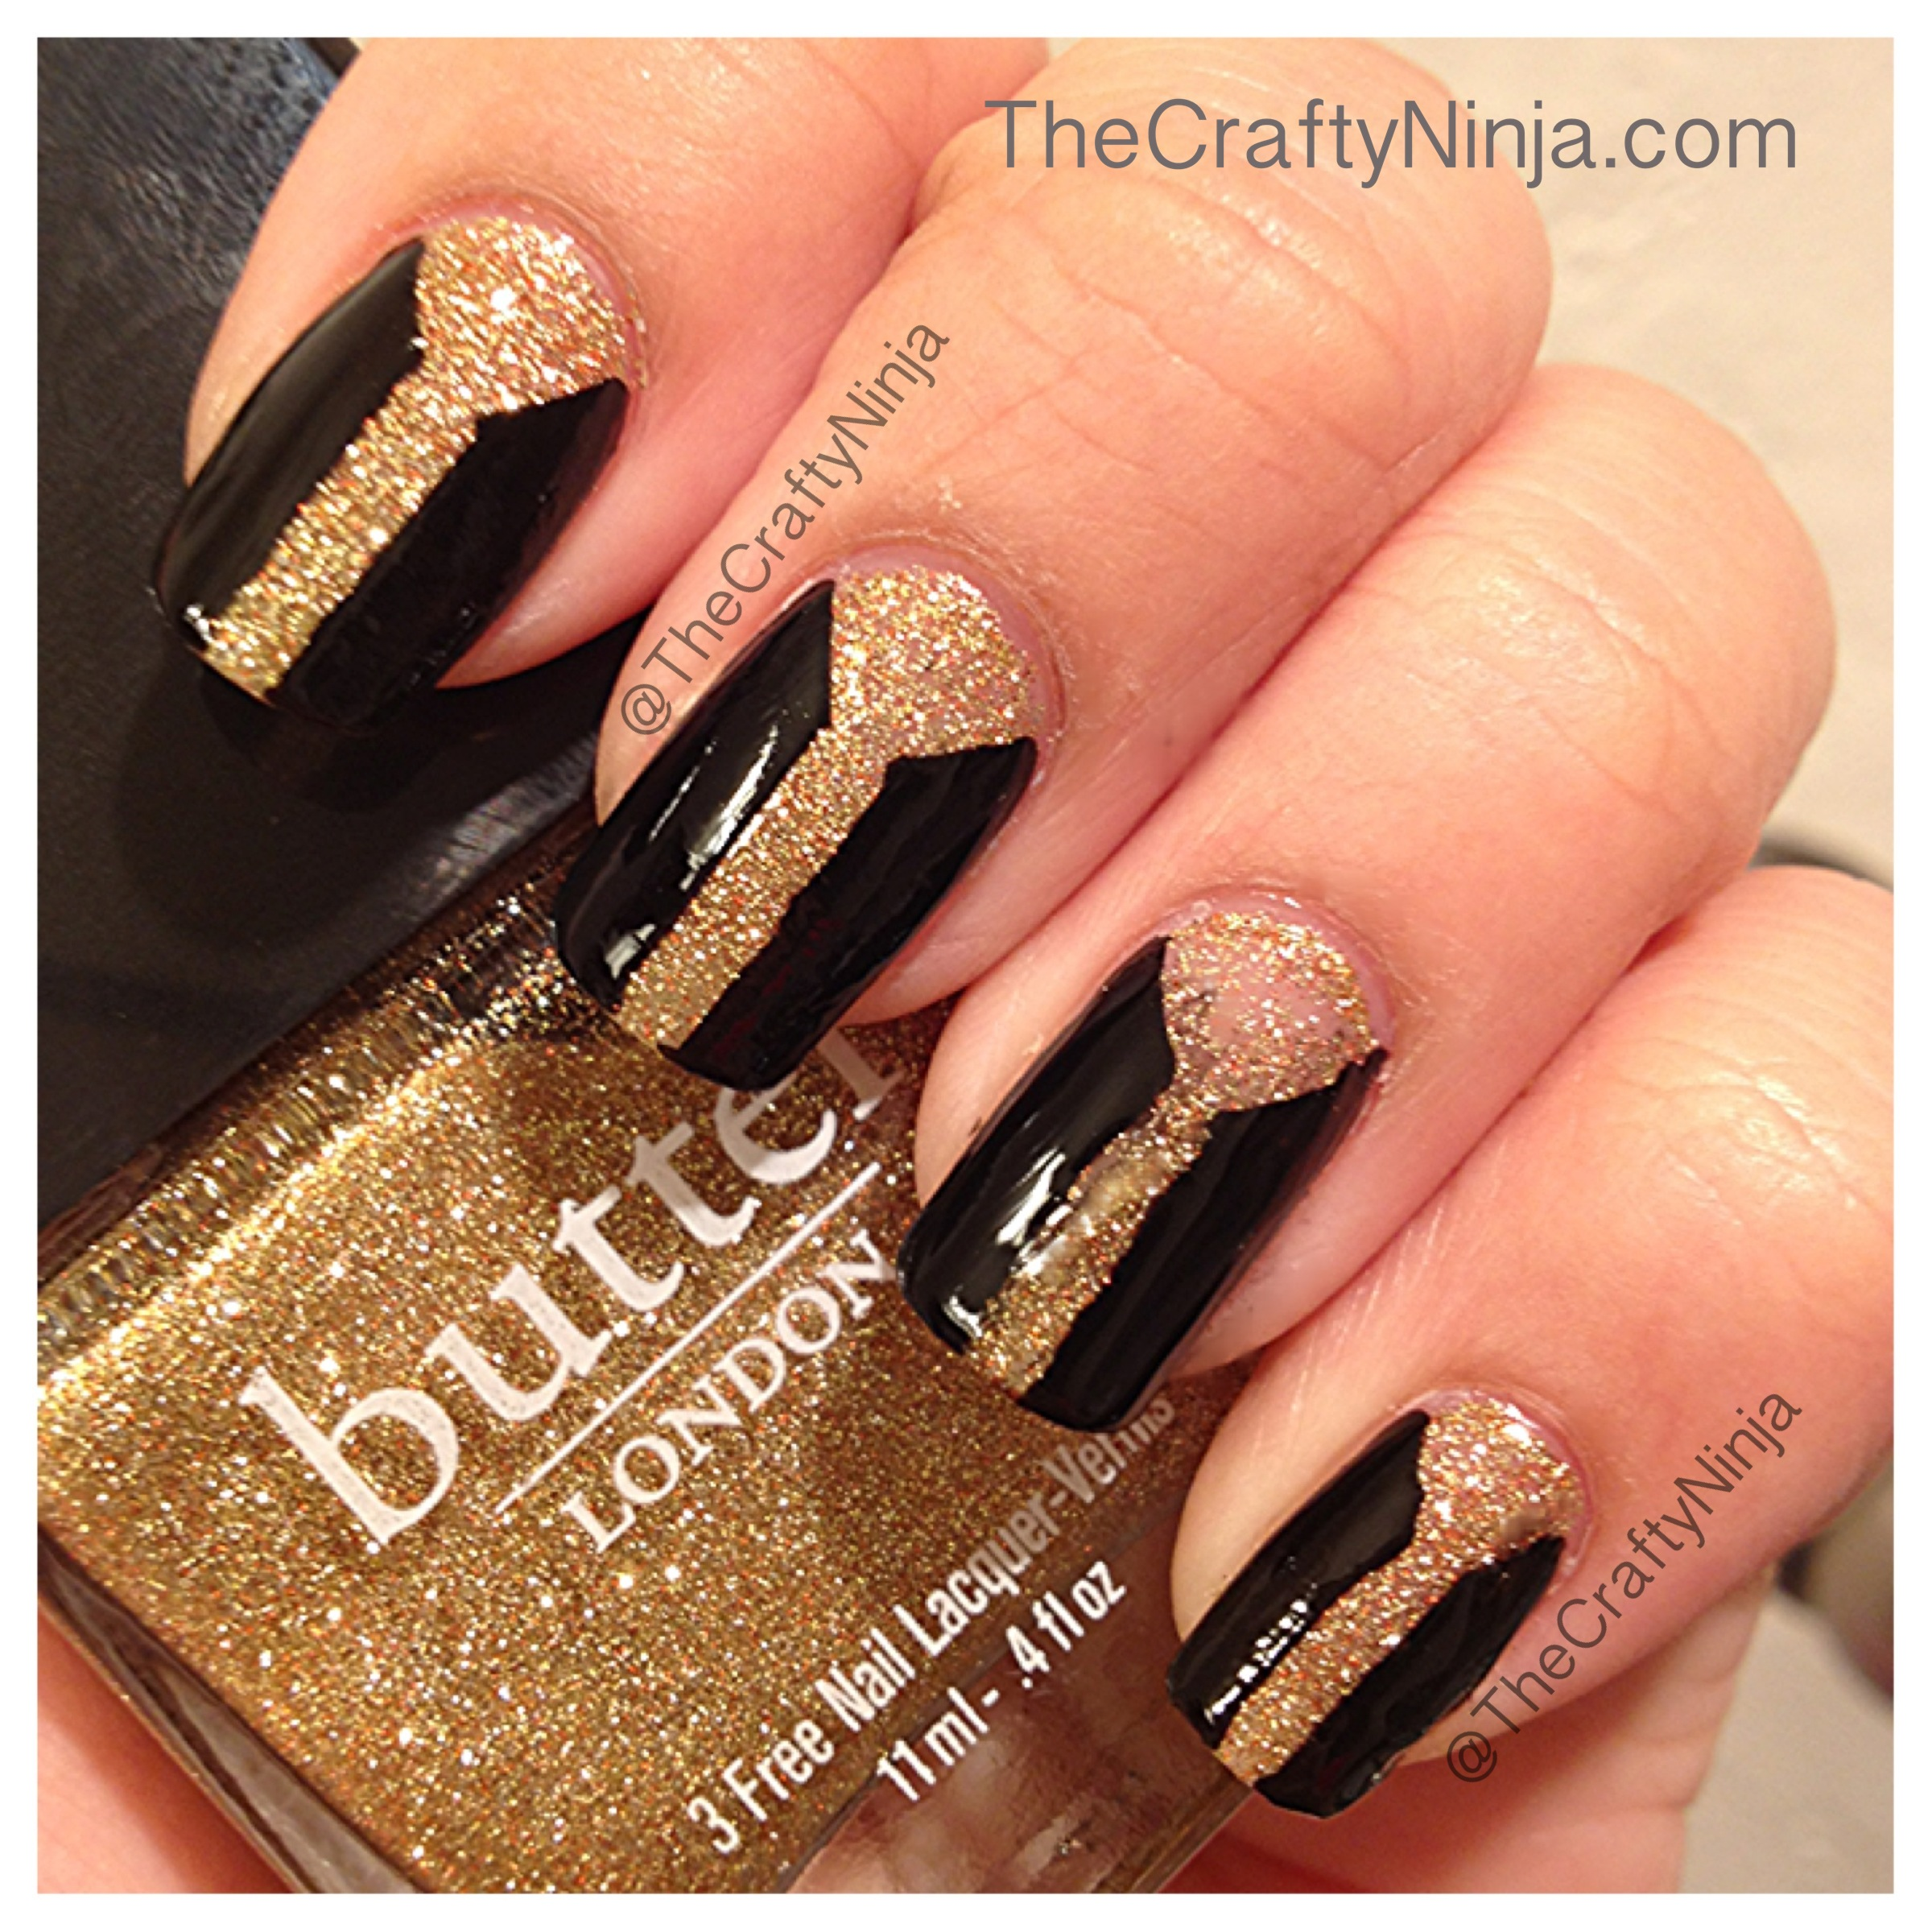 Black And Gold Nails The Crafty Ninja